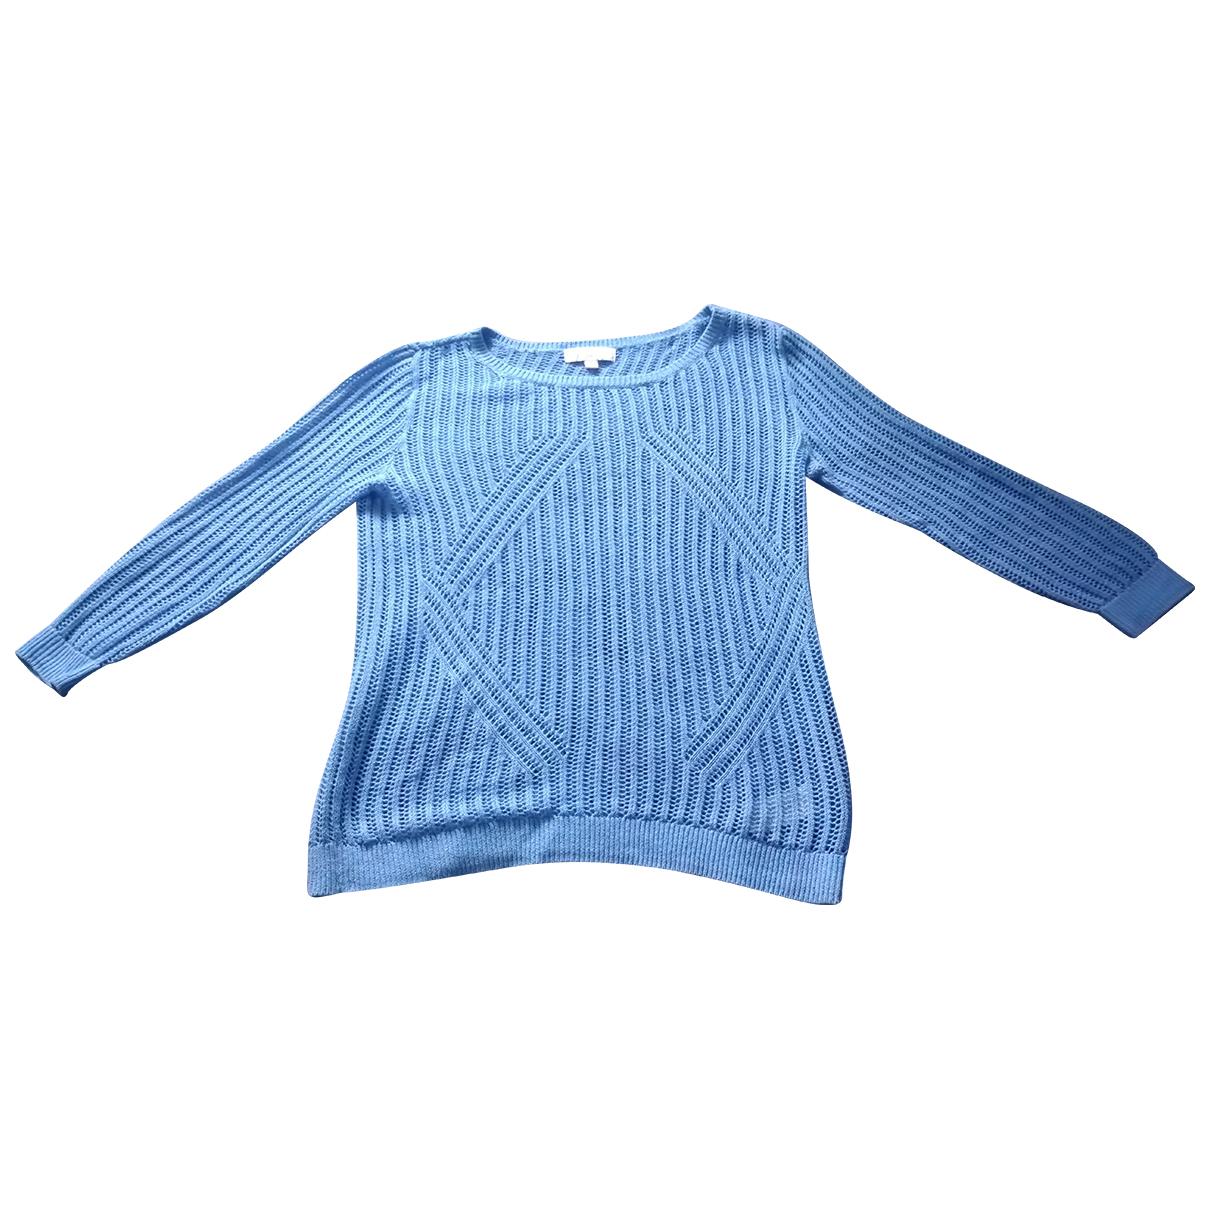 Michael Kors - Pull   pour femme en lin - bleu